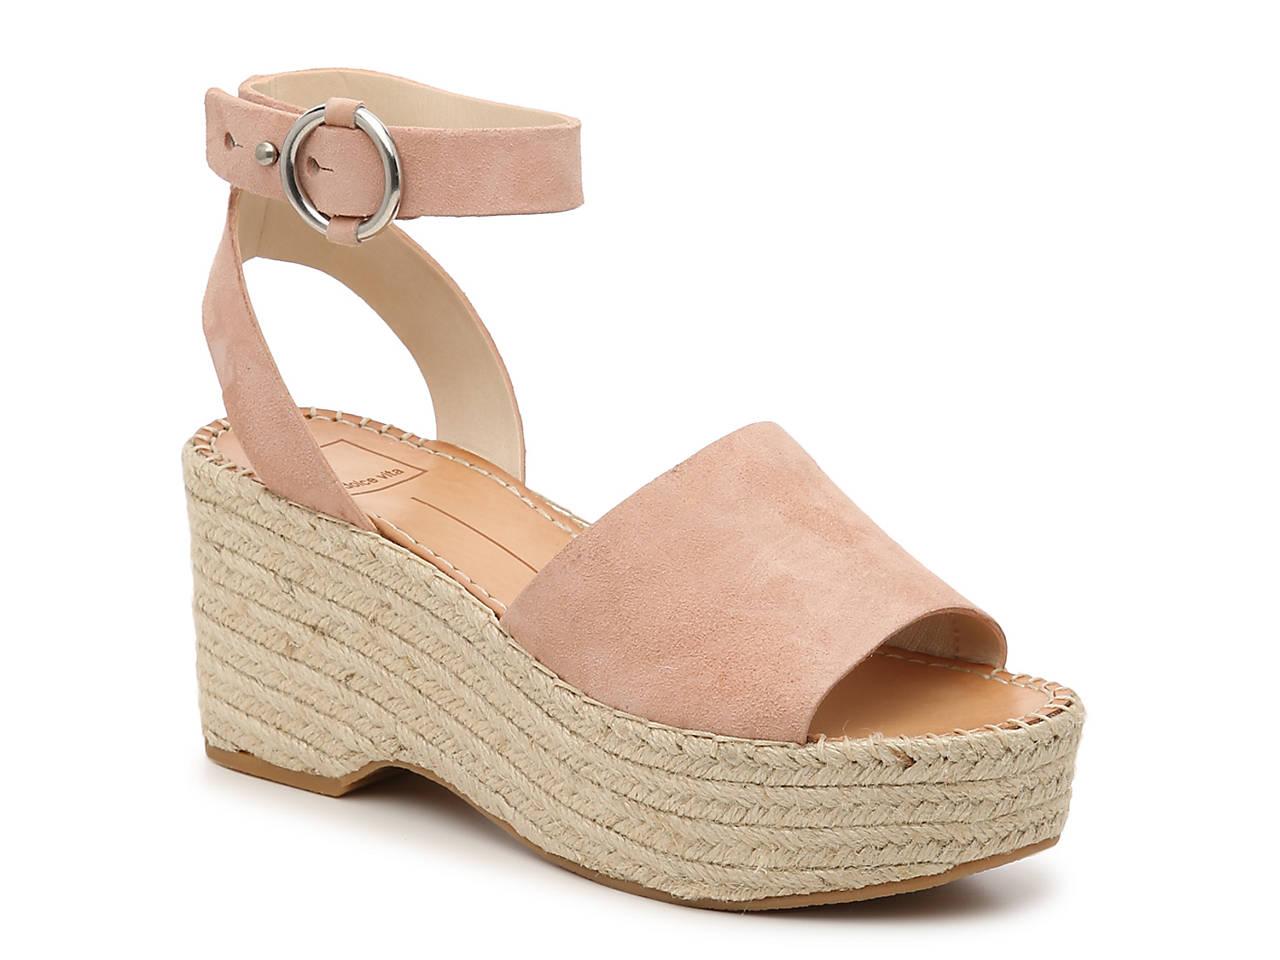 71dc367a991f Dolce Vita Lesly Platform Sandal Women s Shoes